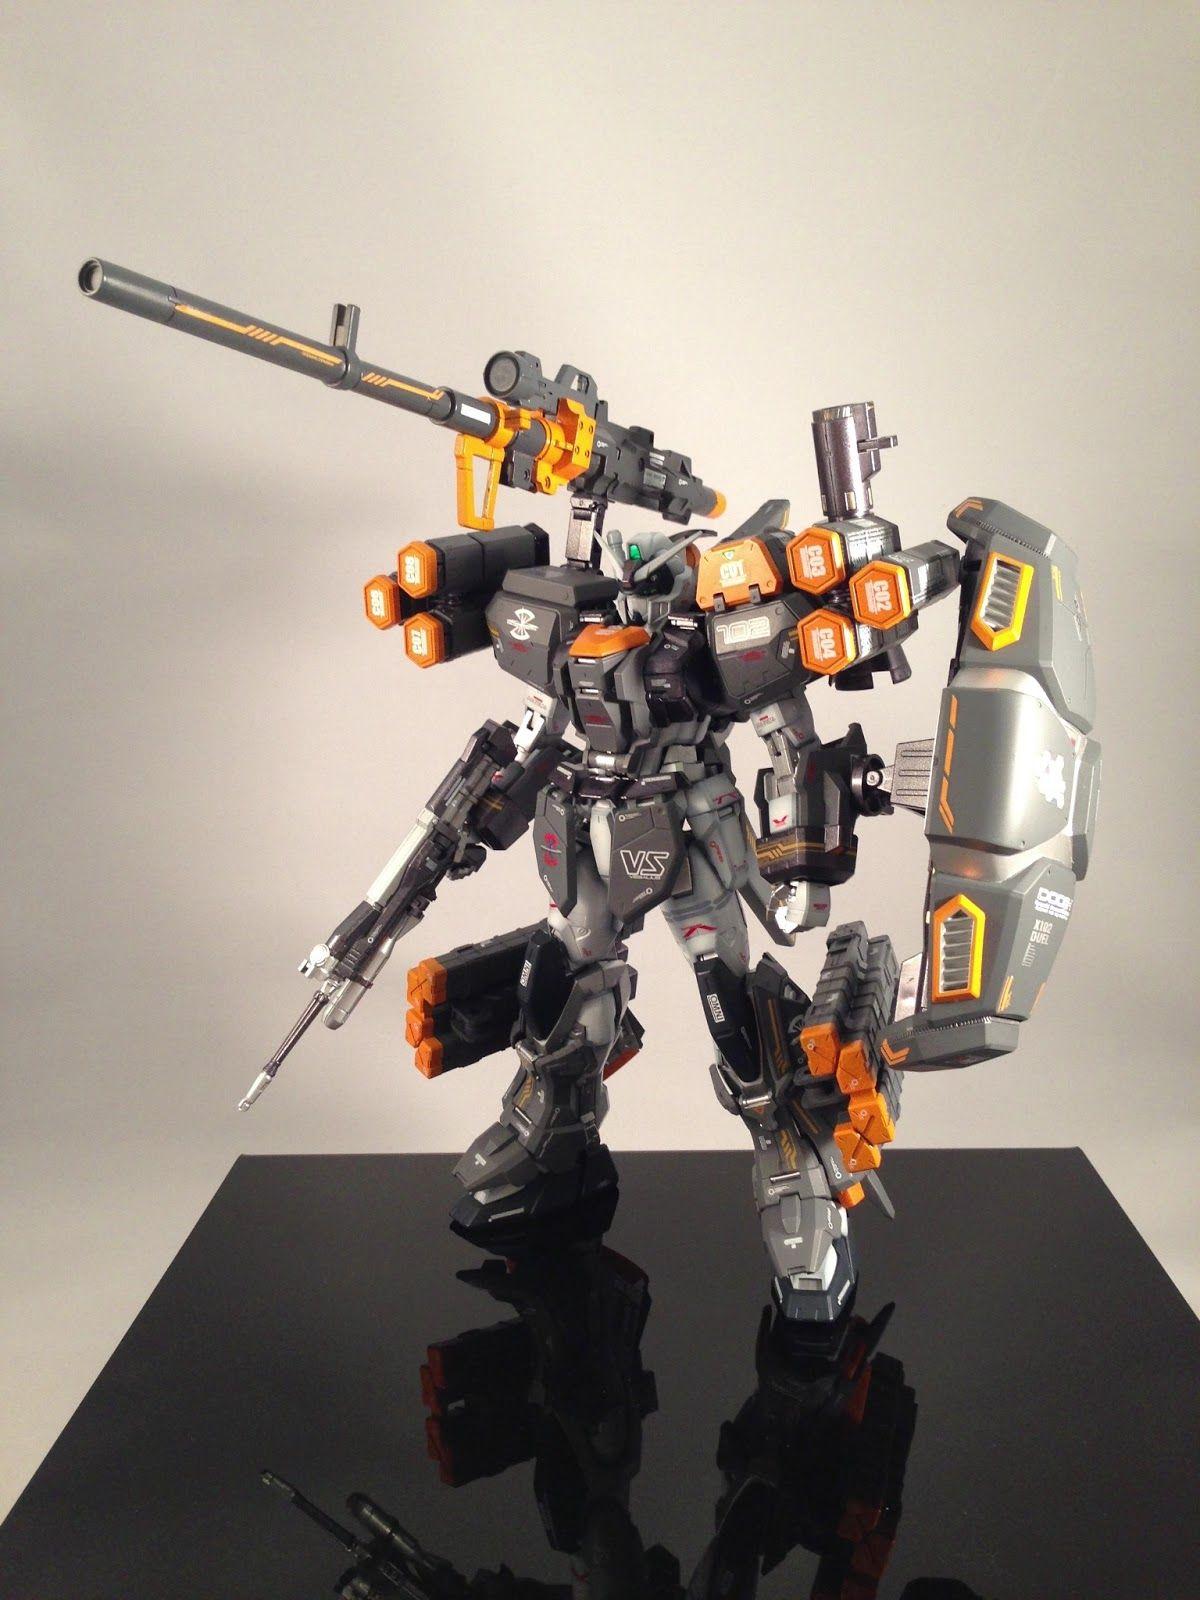 Pin By Tewmaw On Badass Gundams